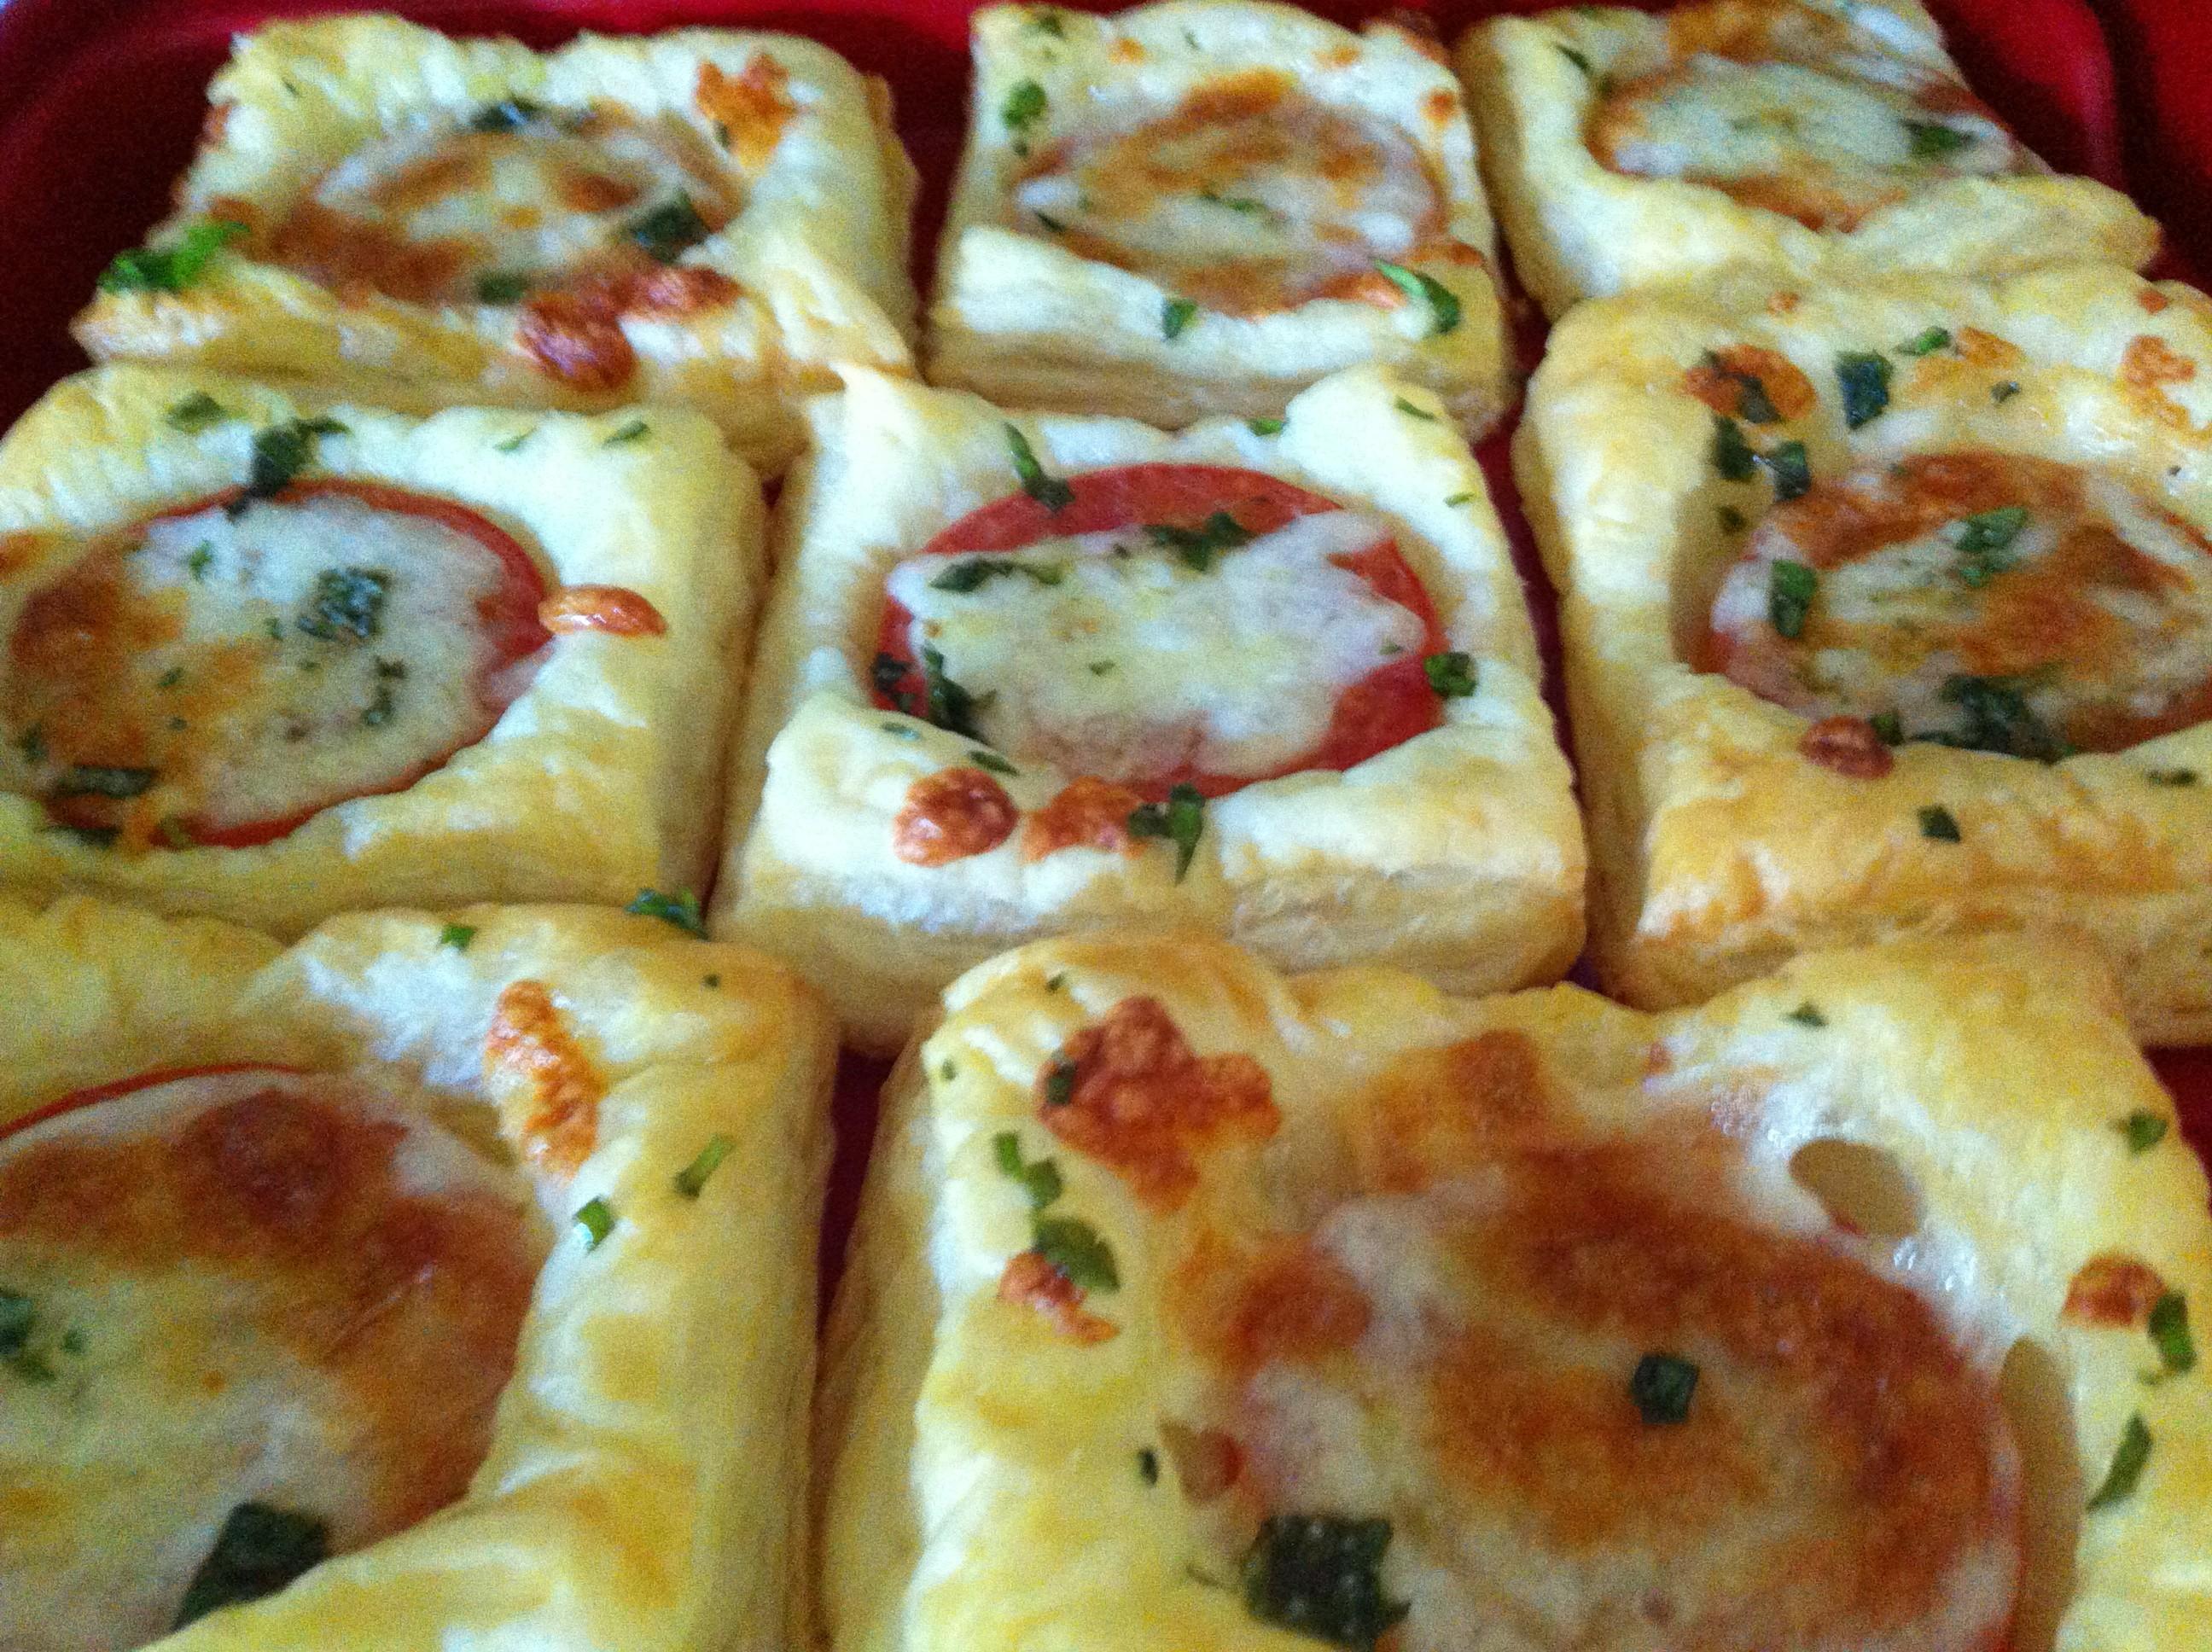 Sommerküche Tomaten : Tomaten blätterteig quadrate chaoshoch